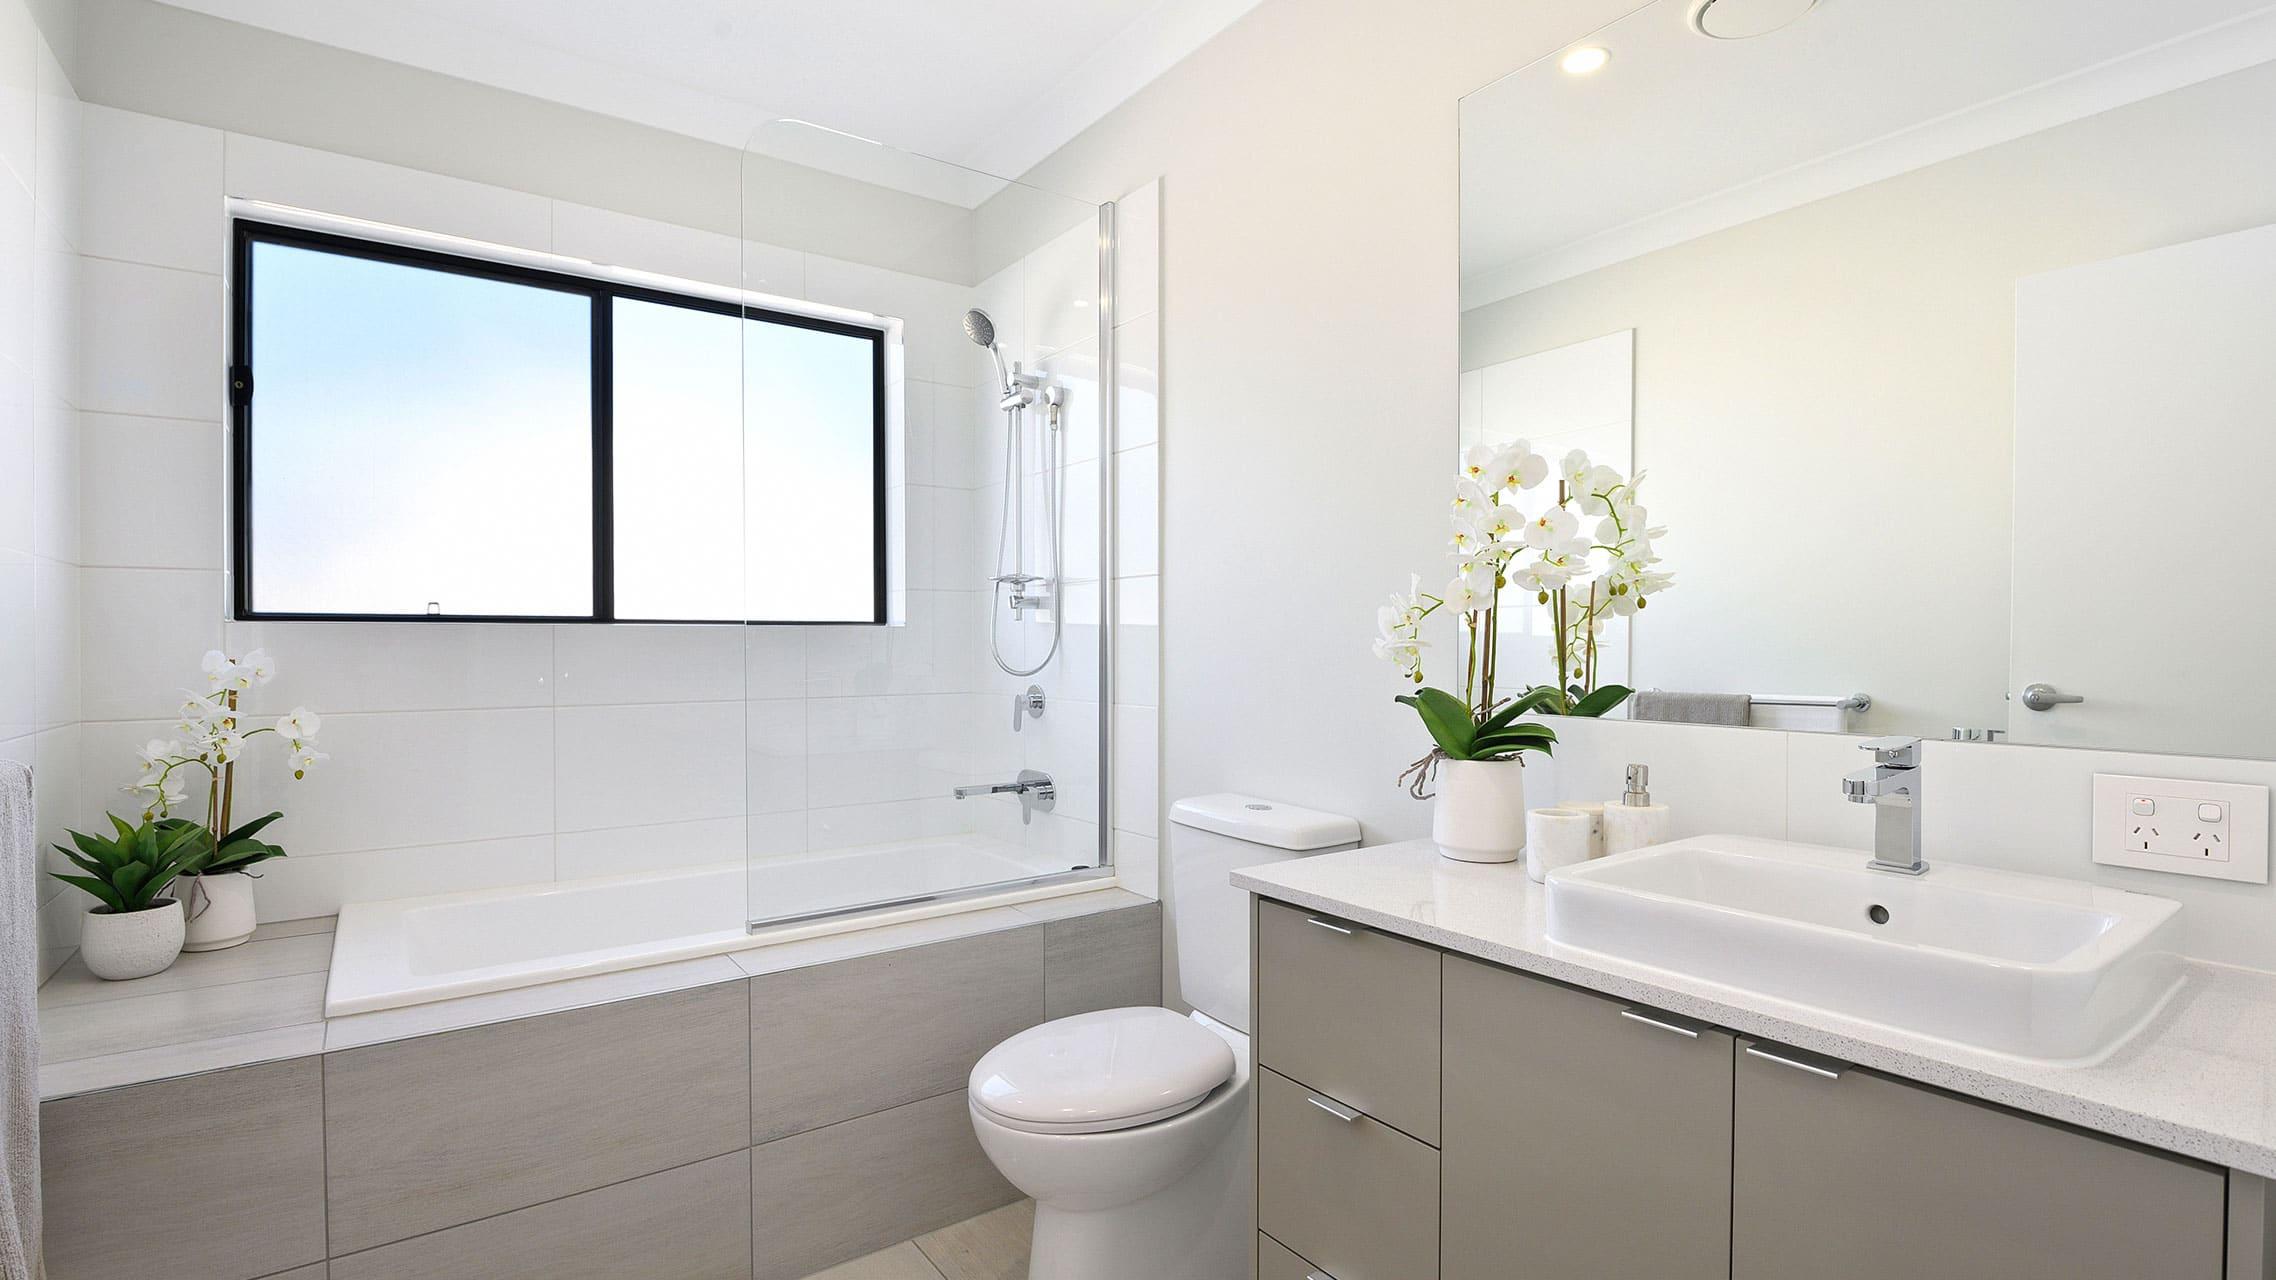 Fixed Shower Screen on a bathtub